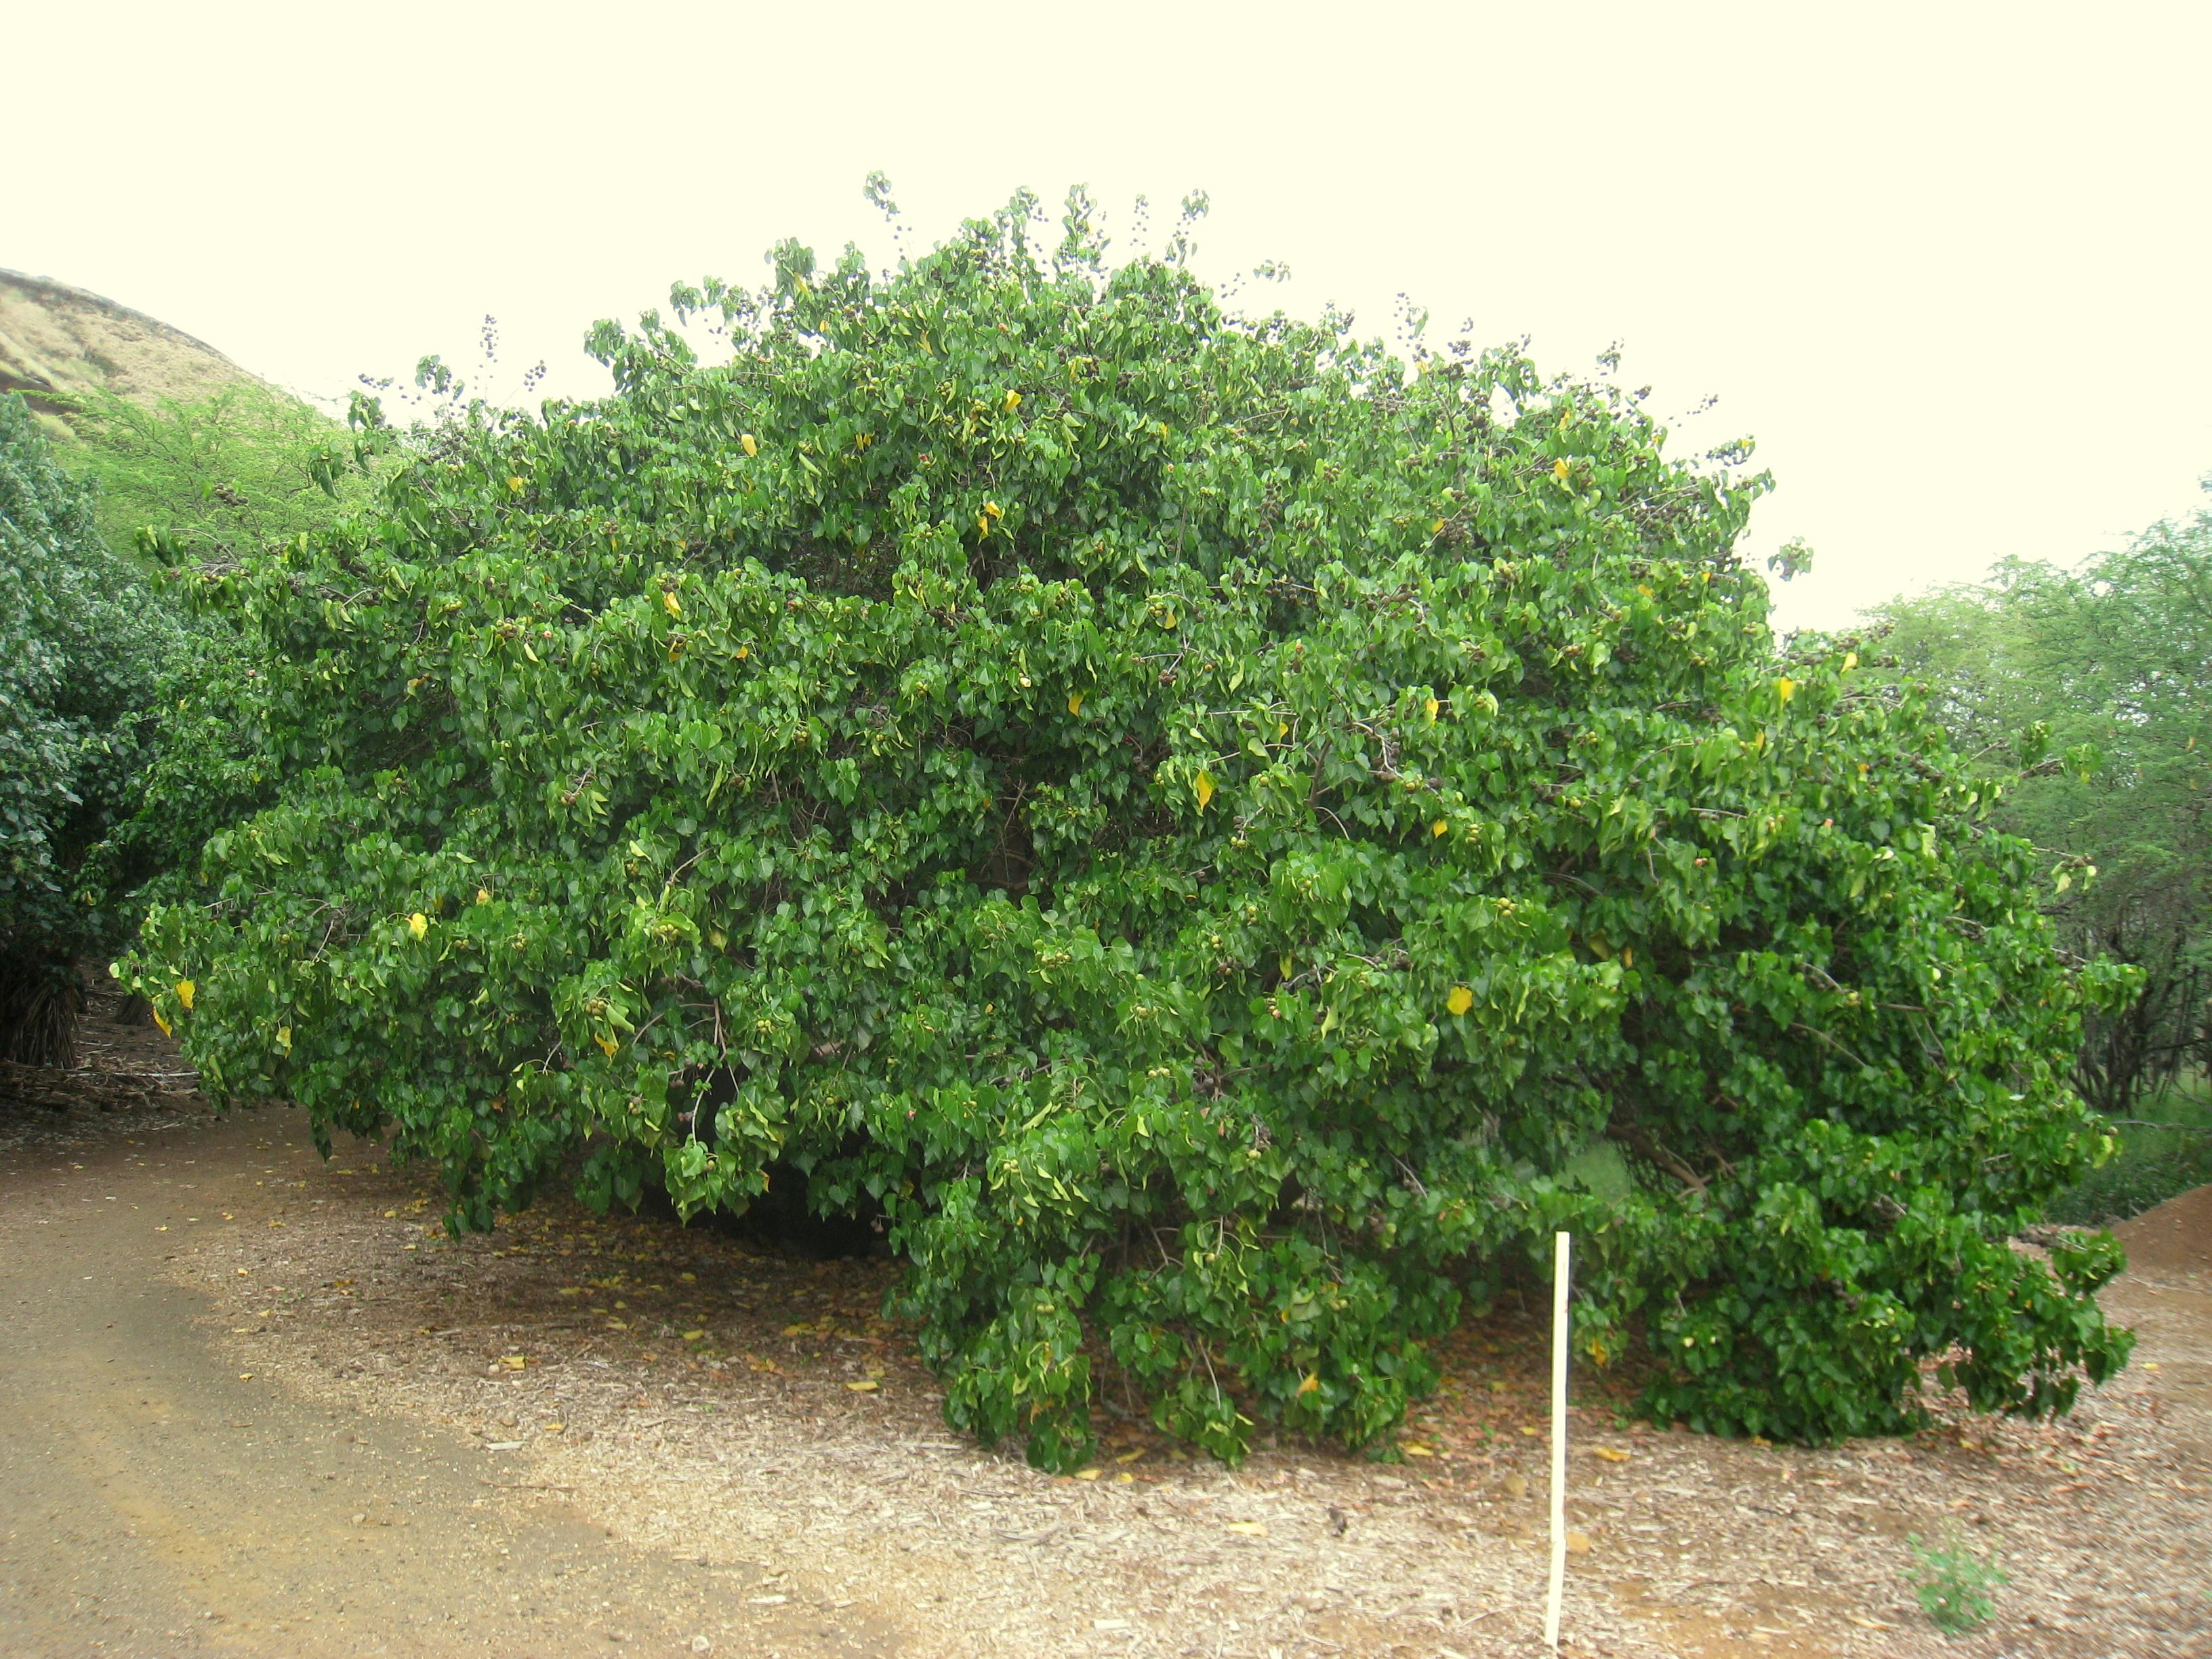 File Thespesia Populnea Koko Crater Botanical Garden Img 2169 Jpg Wikimedia Commons